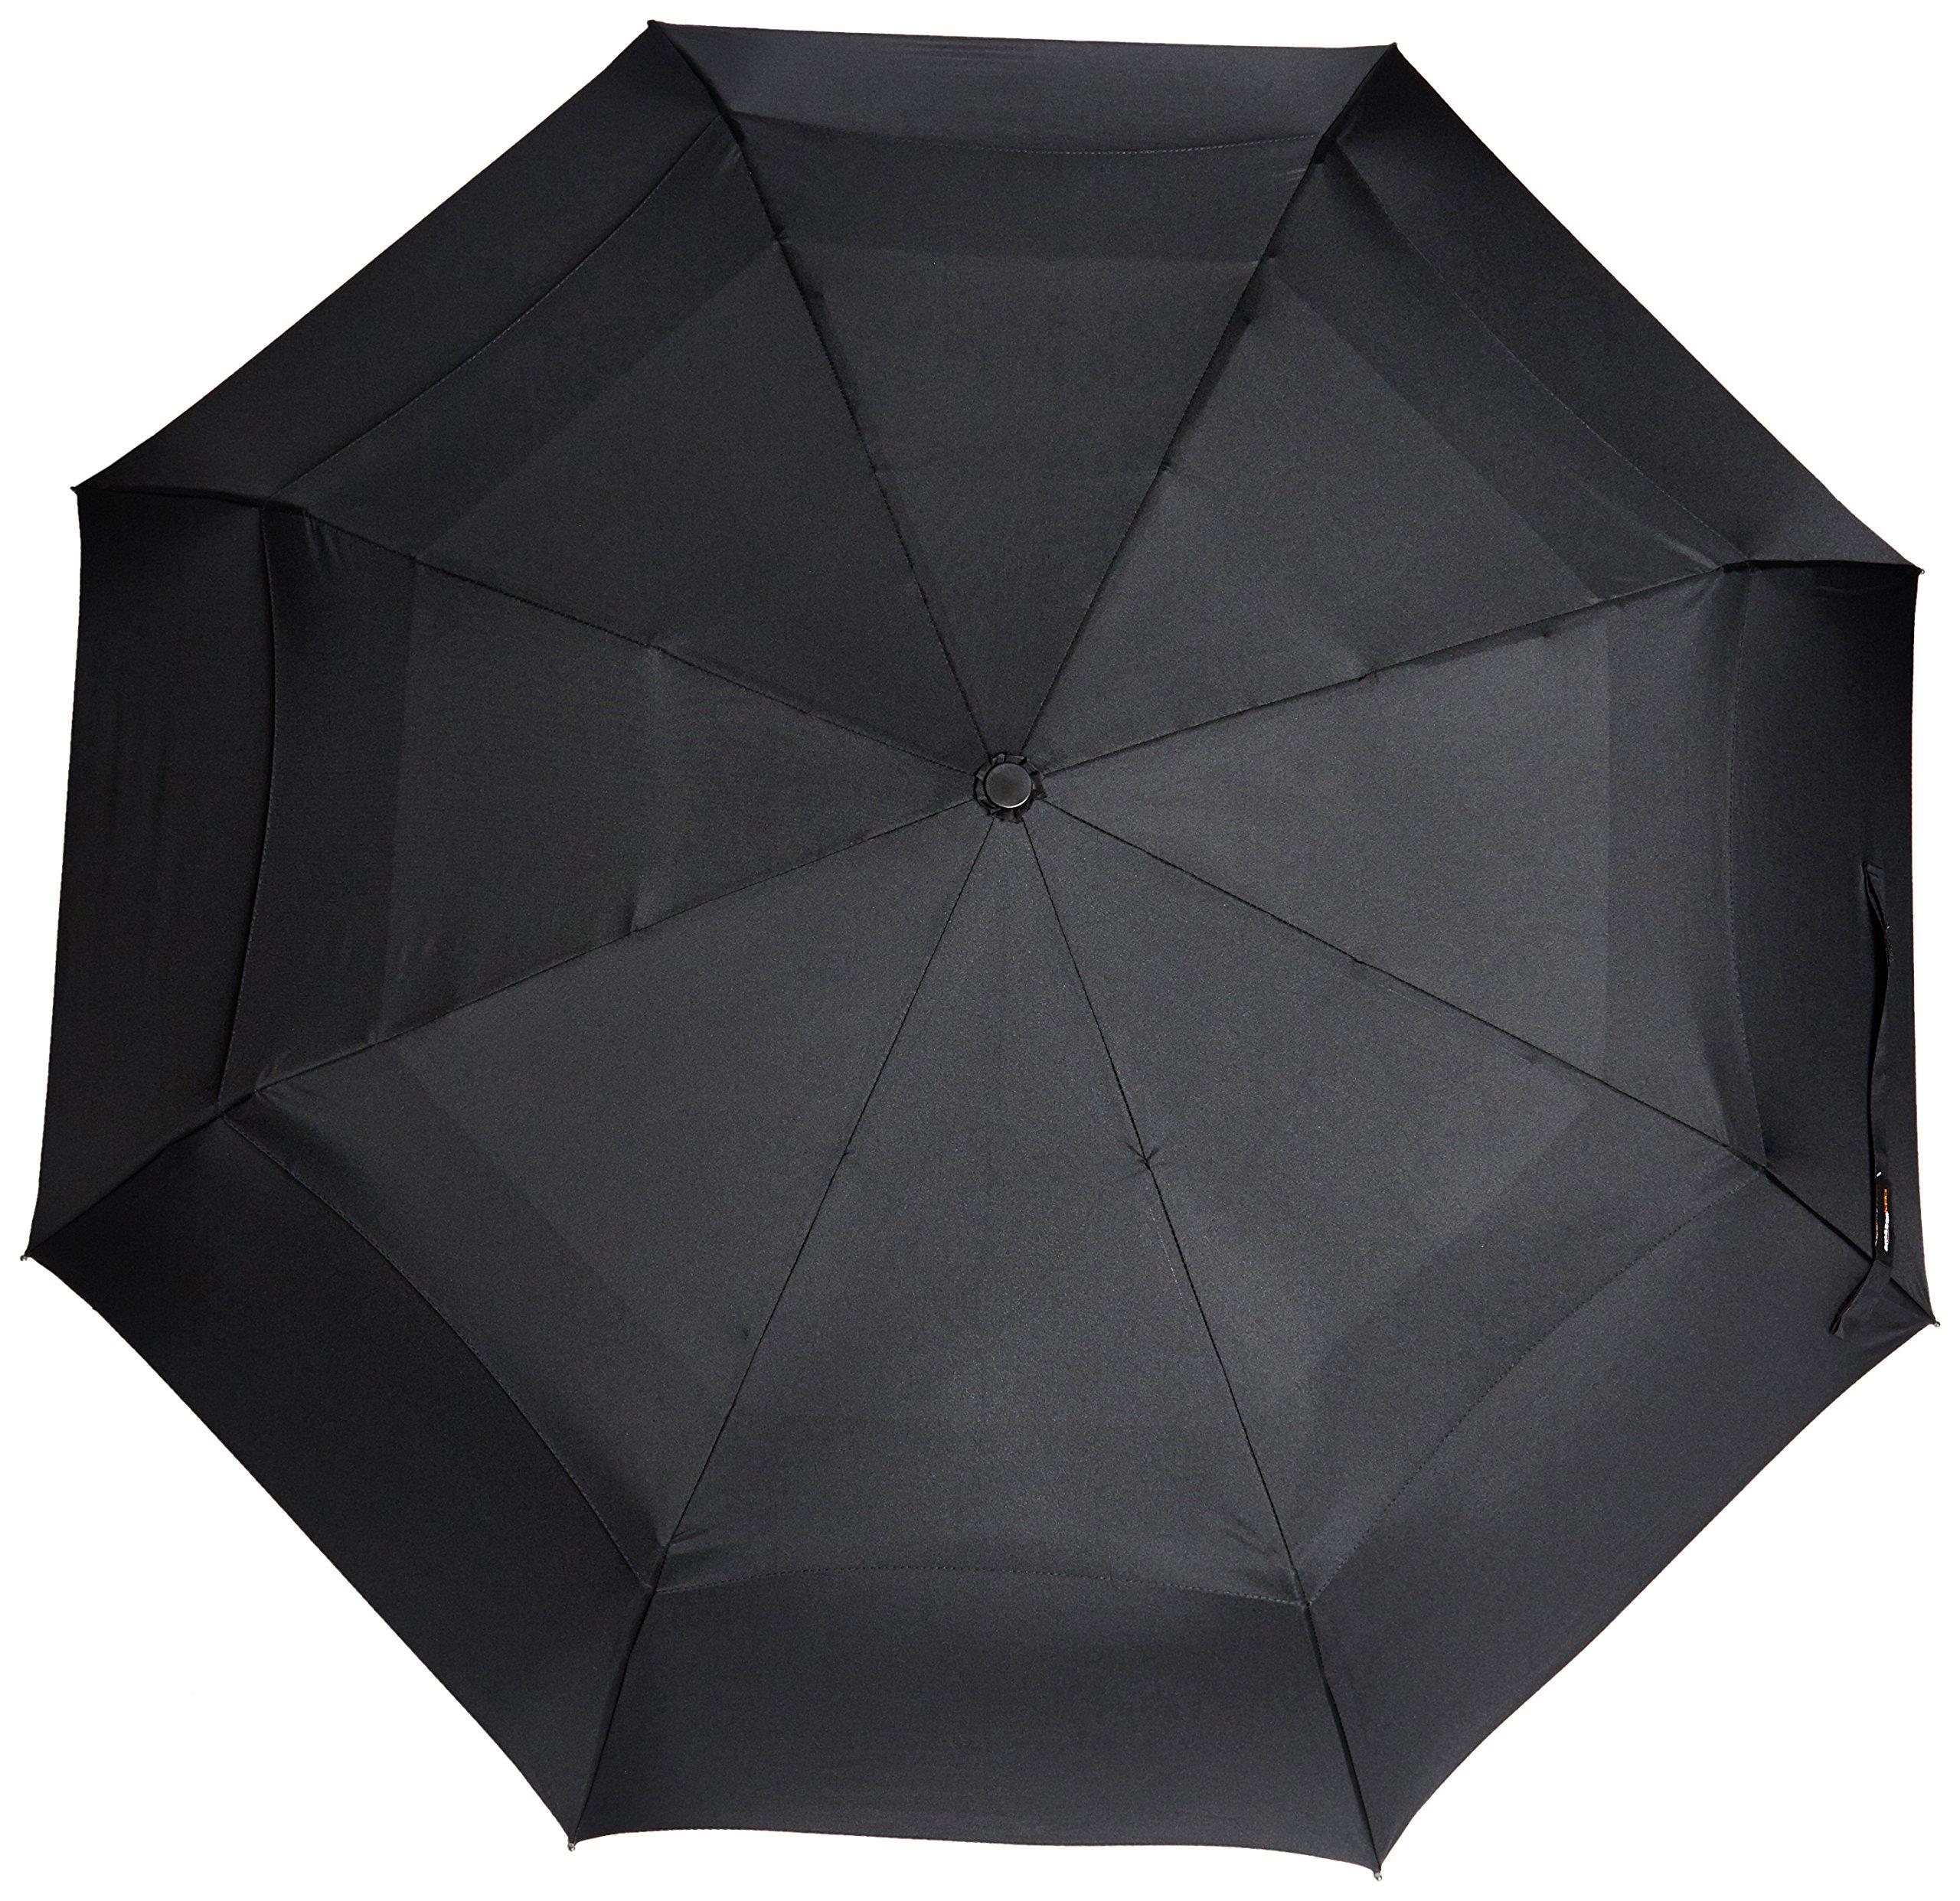 AmazonBasics Umbrella with Wind Vent, Light Blue 1